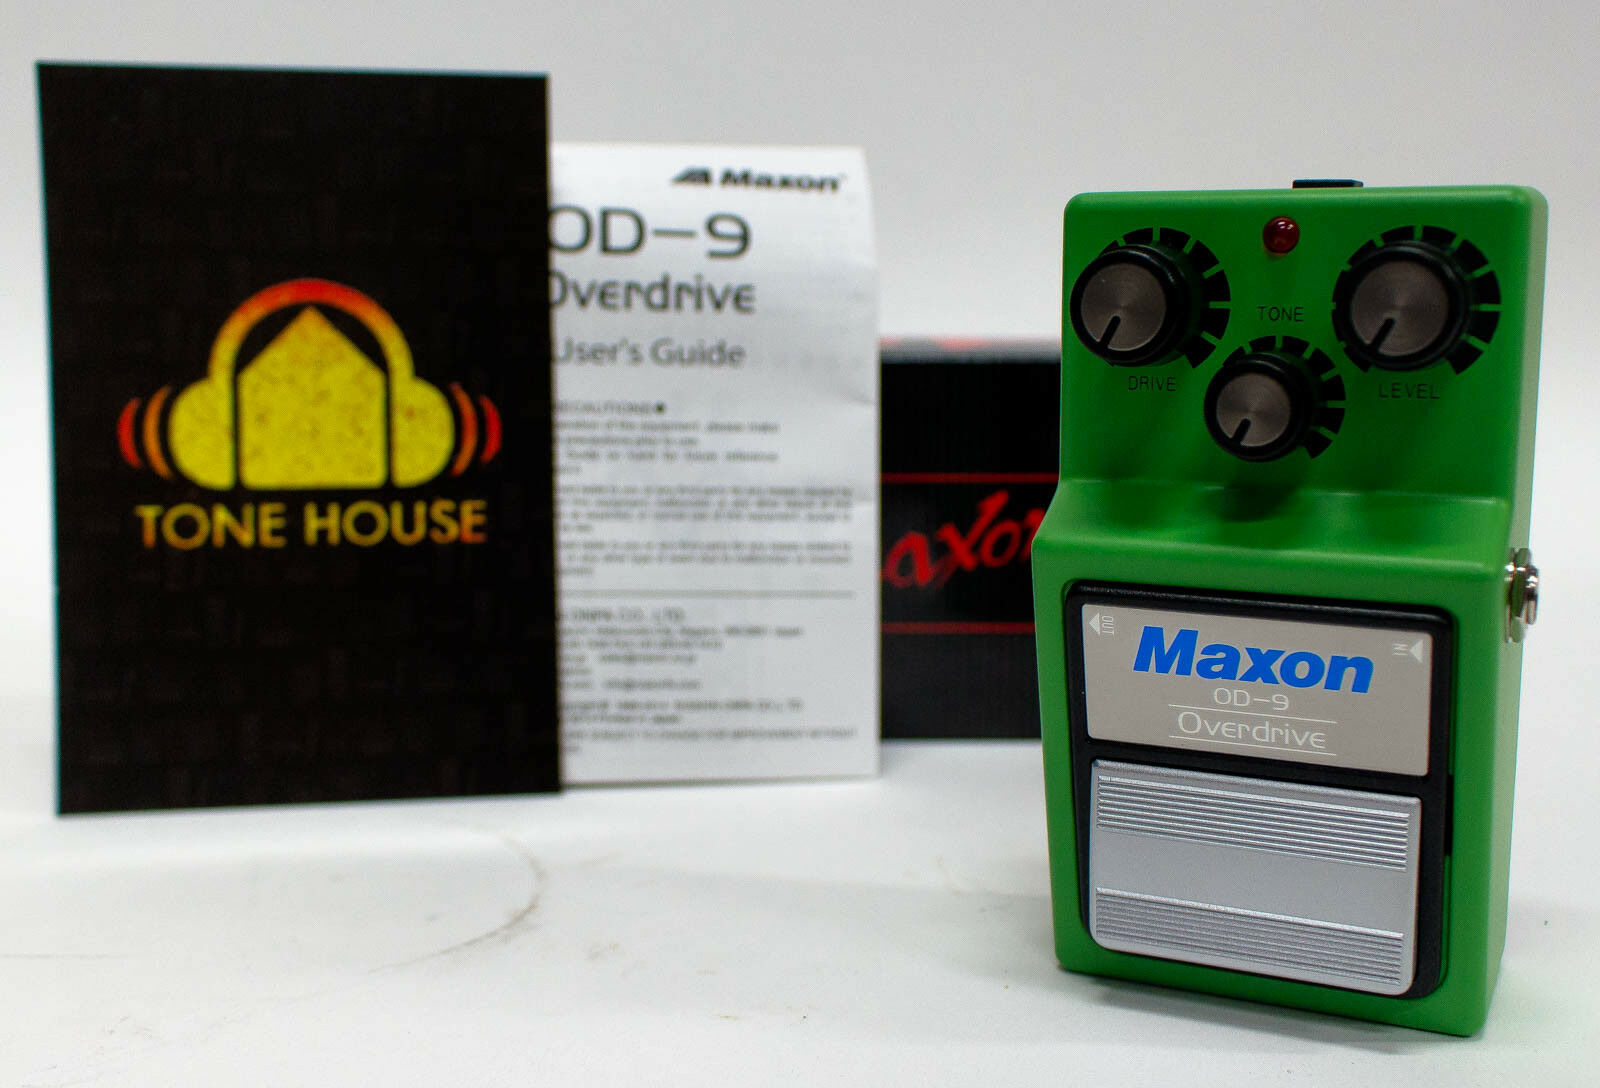 Maxon Nine Series OD9